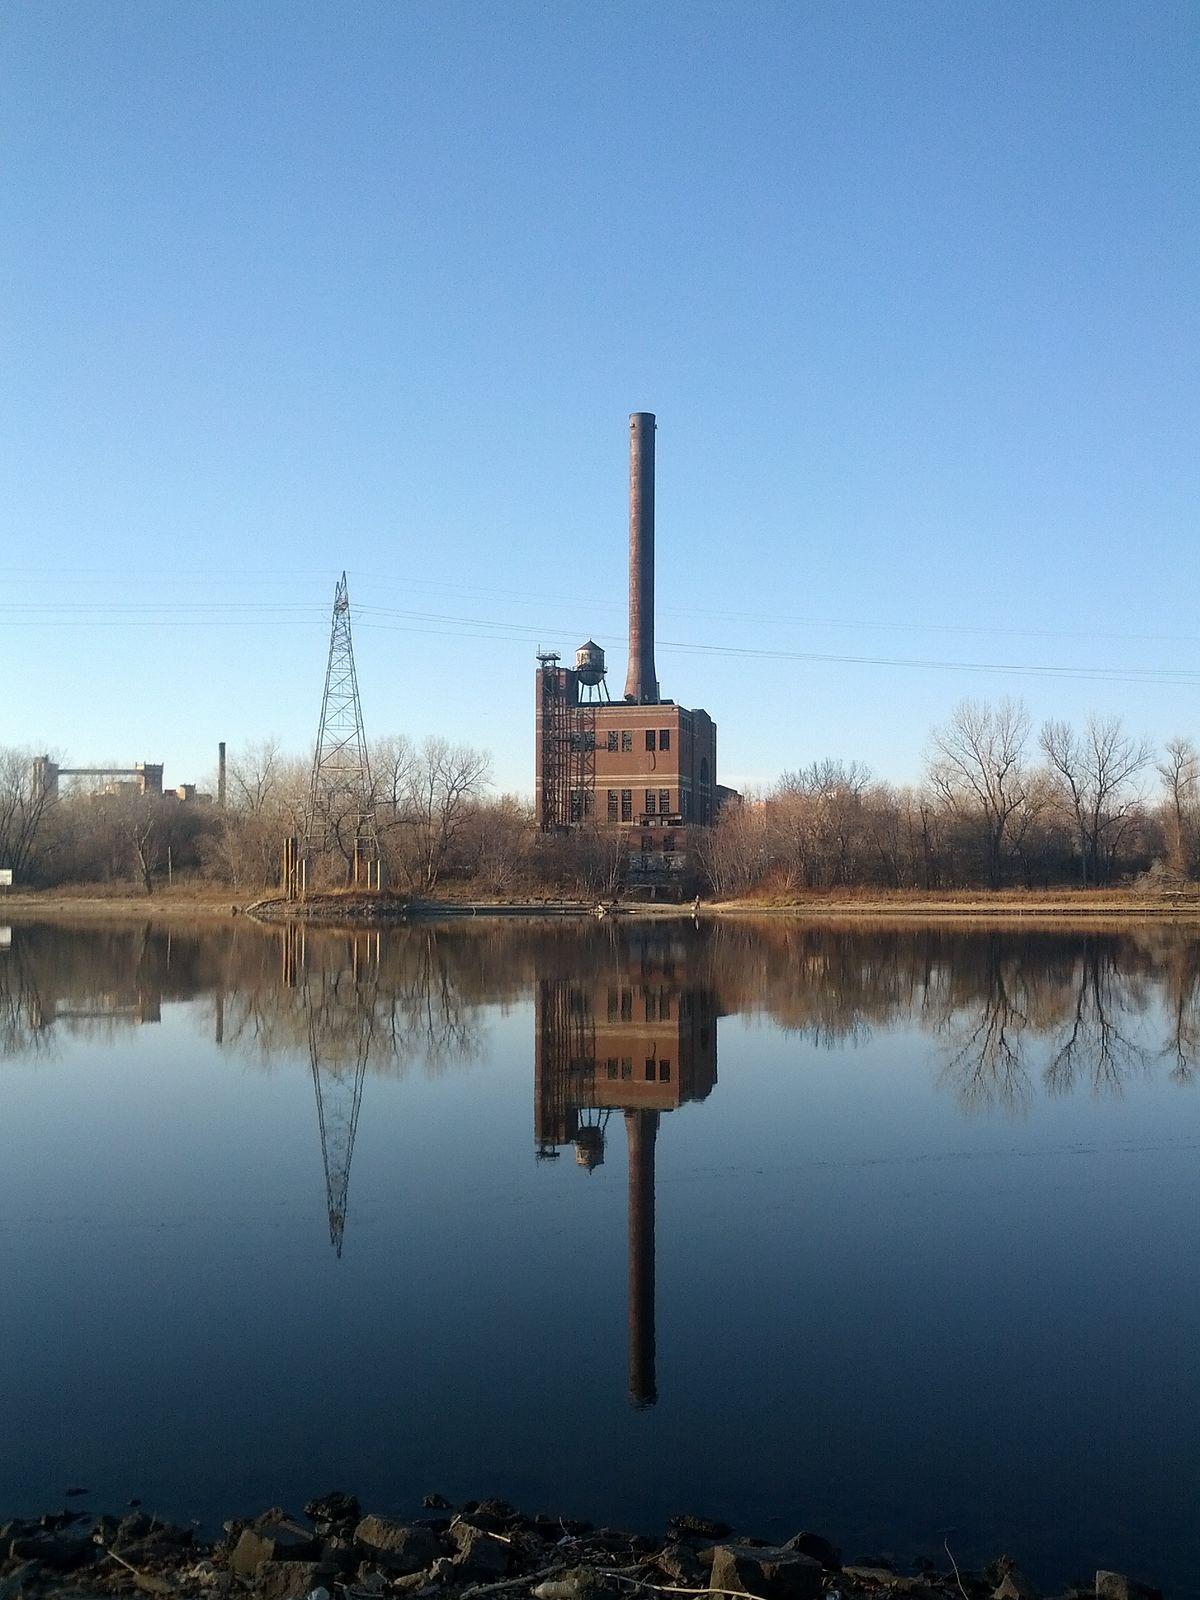 island station power plant